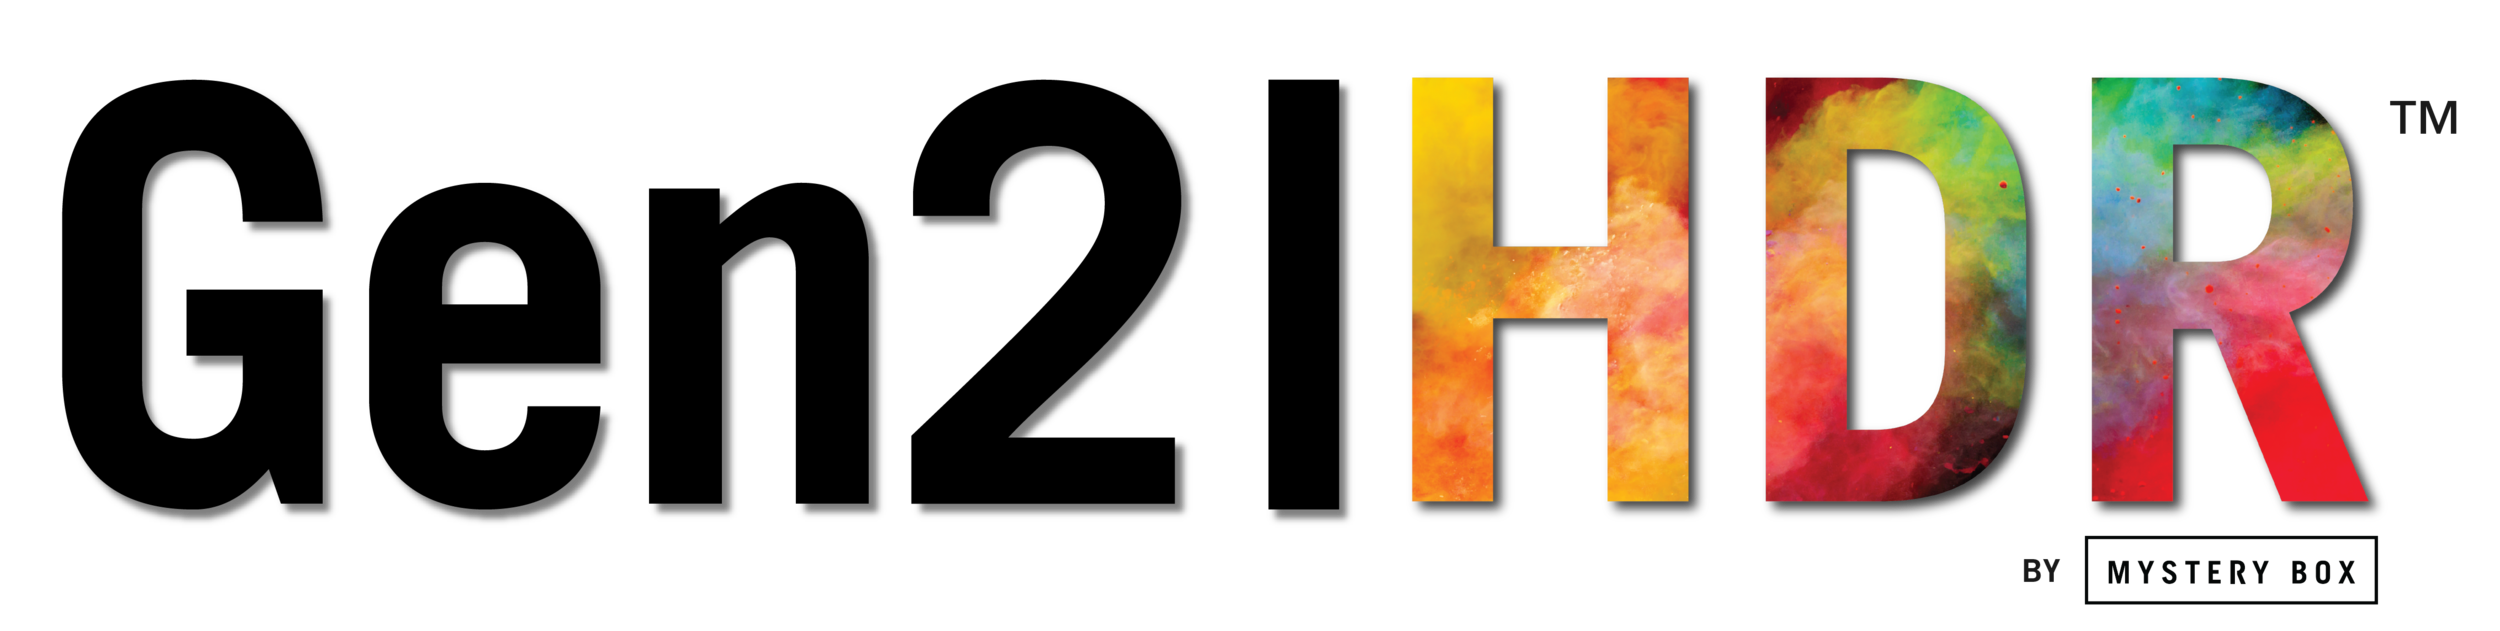 Gen2HDR Logo